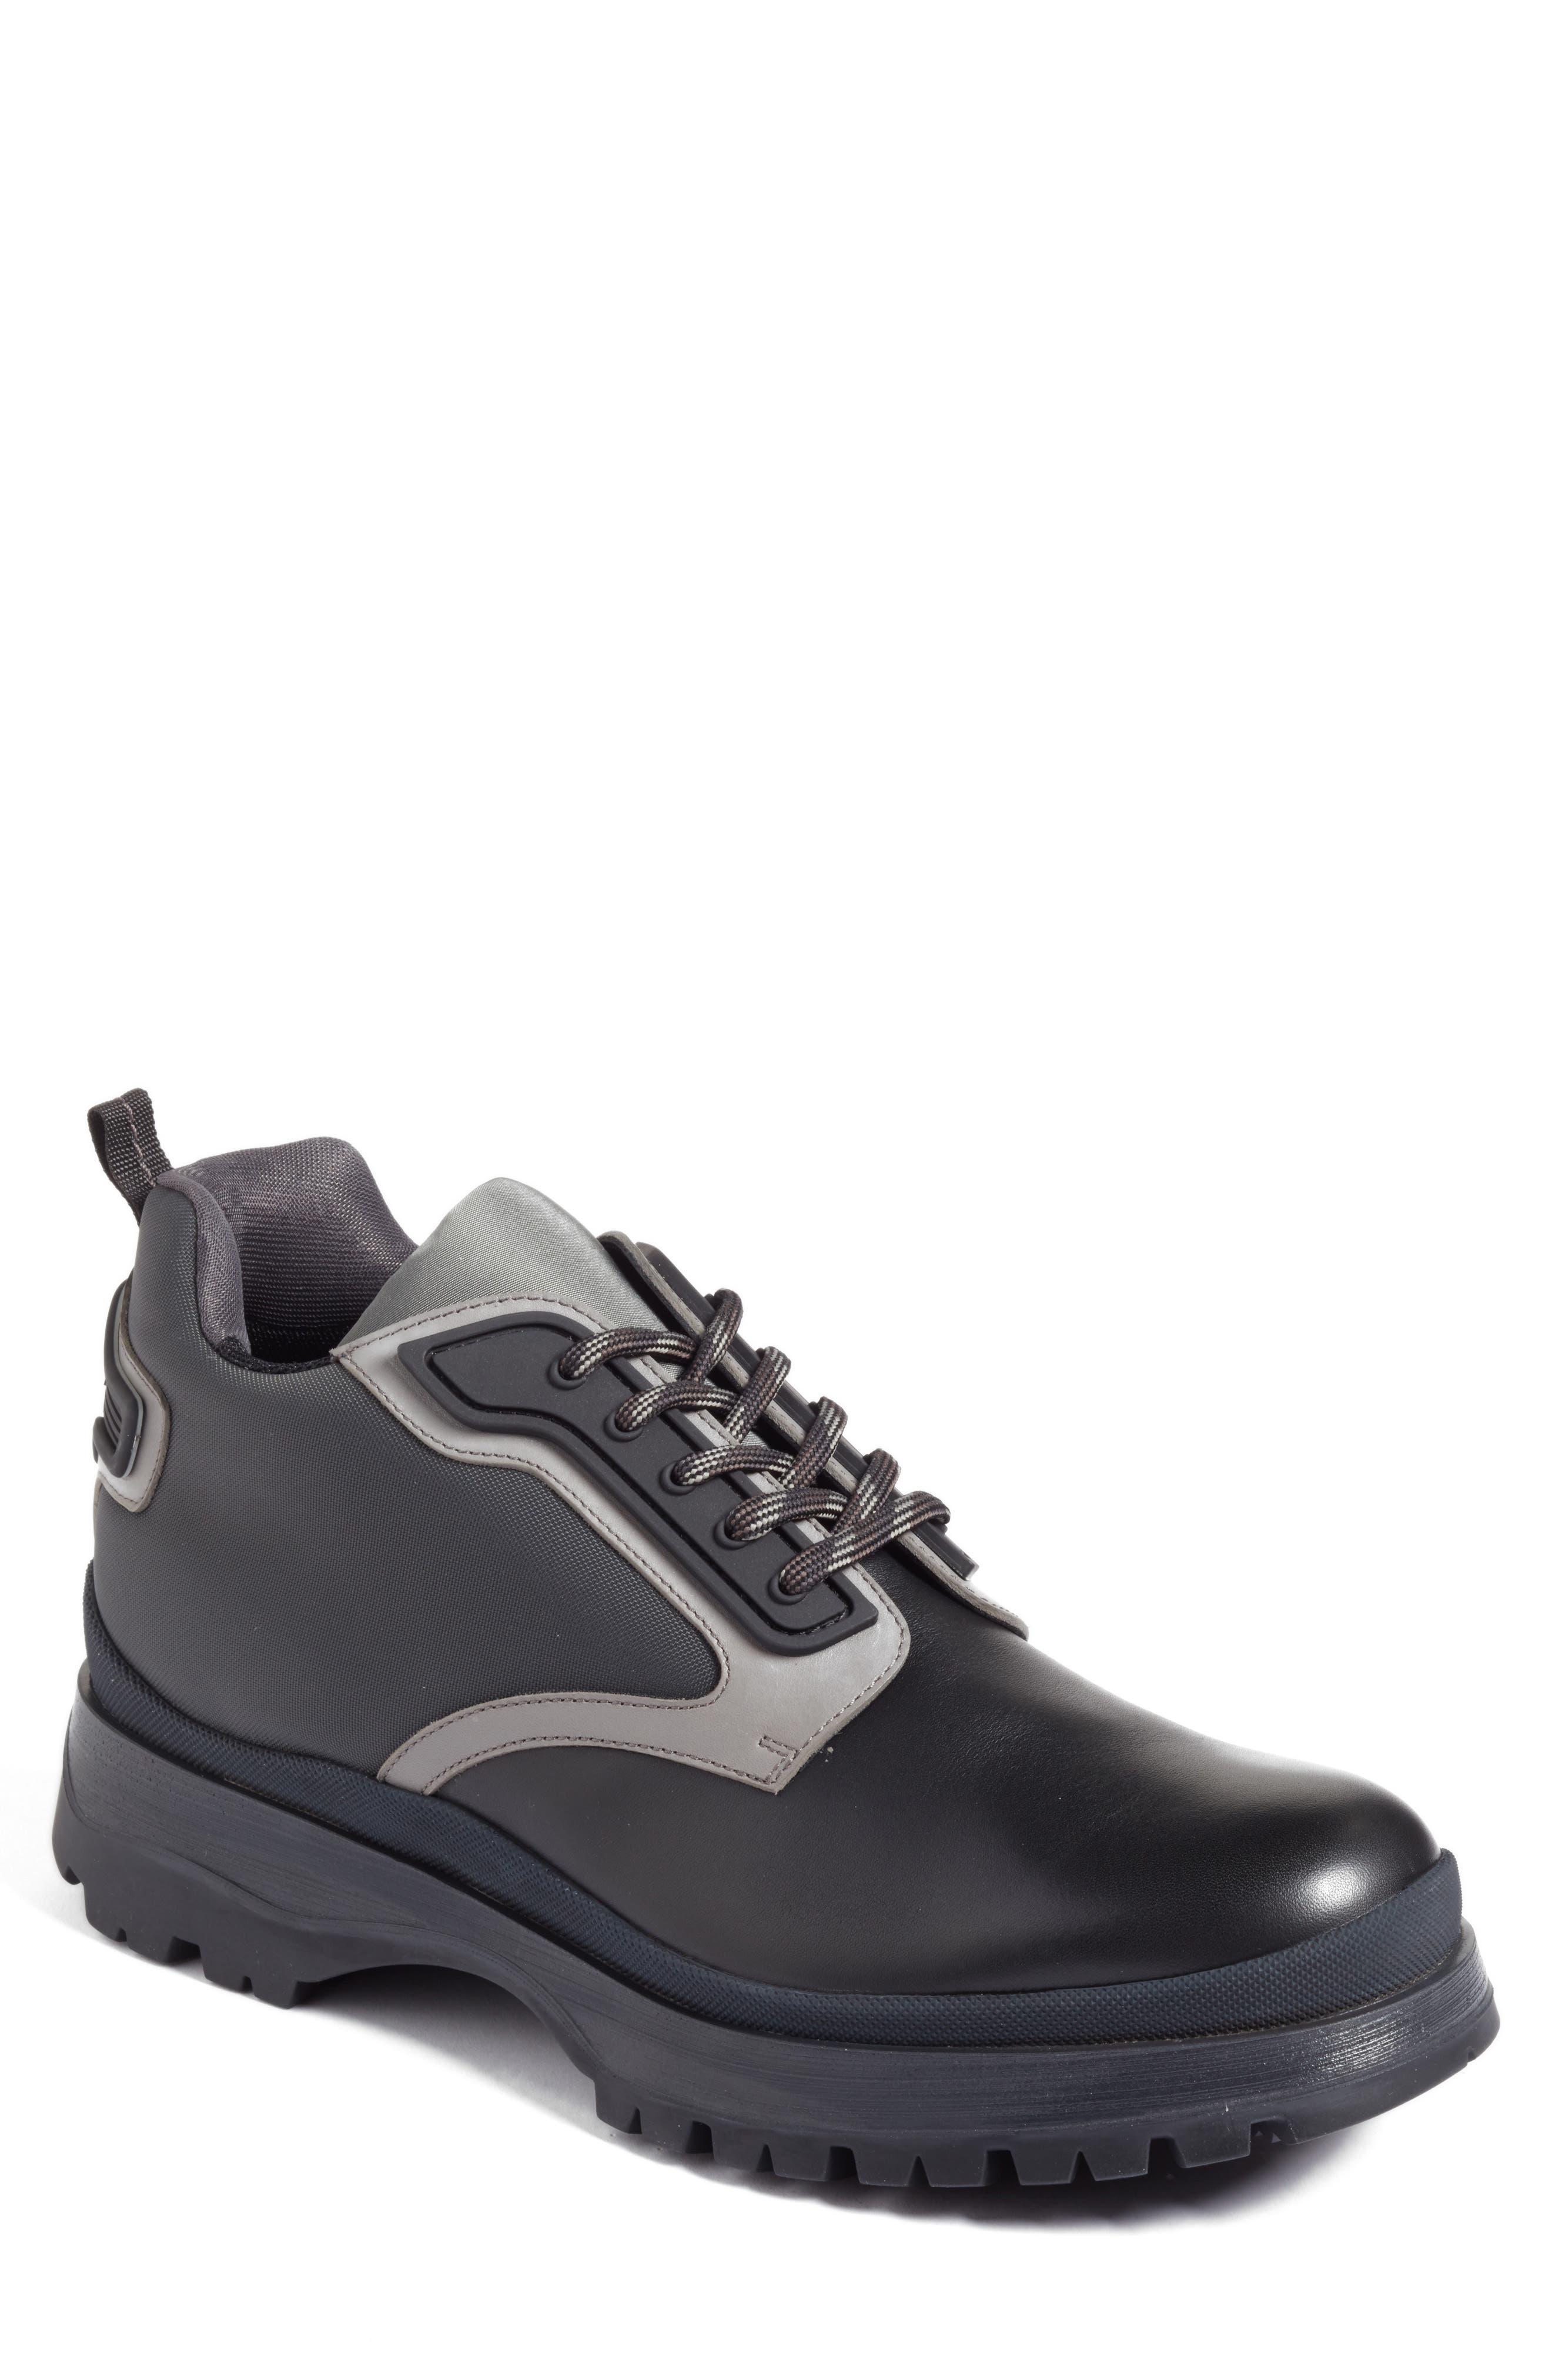 Tech Sneaker Boot,                         Main,                         color, 007